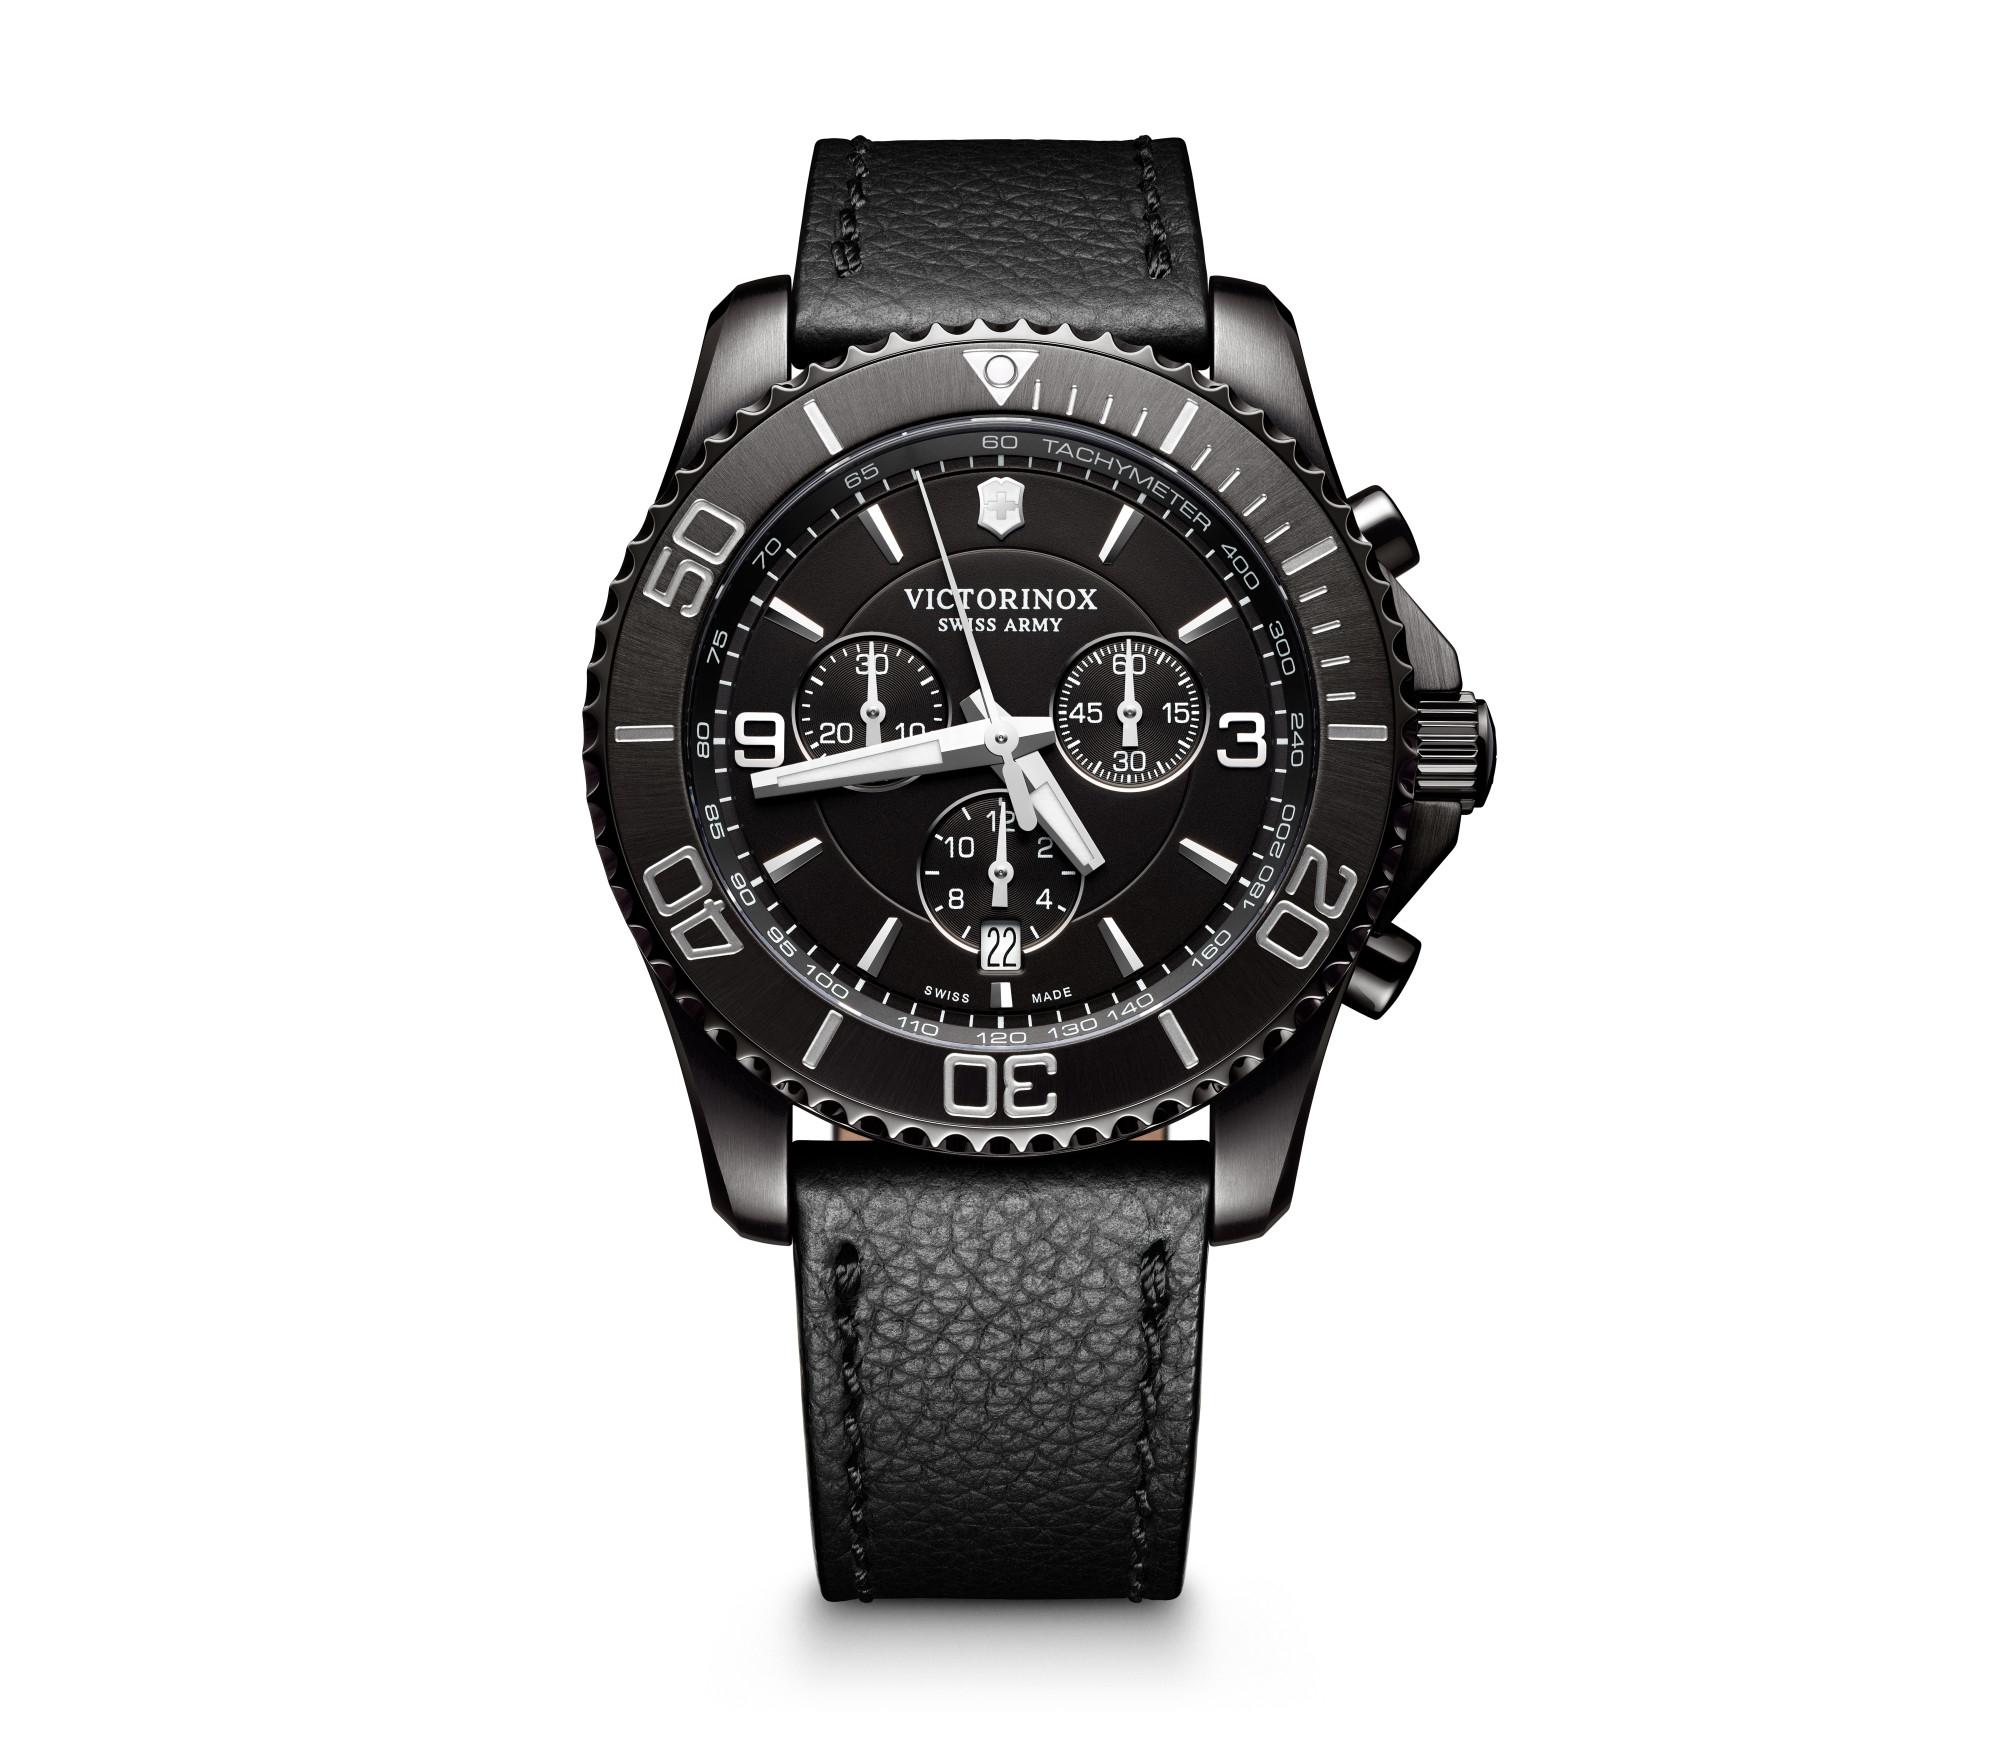 Victorinox Maverick Chronograph Black Edition Herrenuhr mit Saphirglas für 215,84 € (amazon.it)